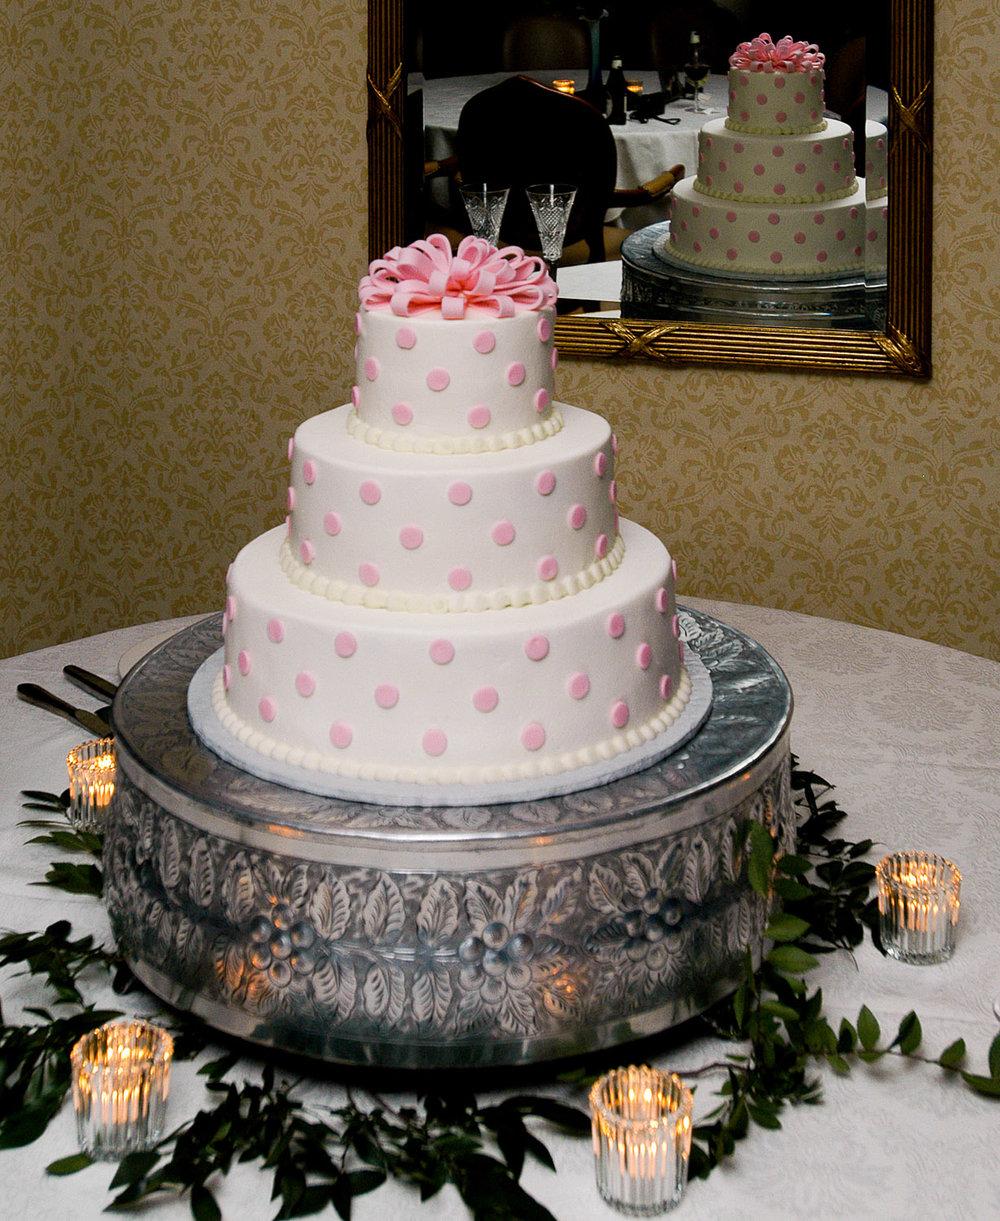 Casler_390906_268_Brackett-VanHouten_Wedding_C_EP_(1).jpg